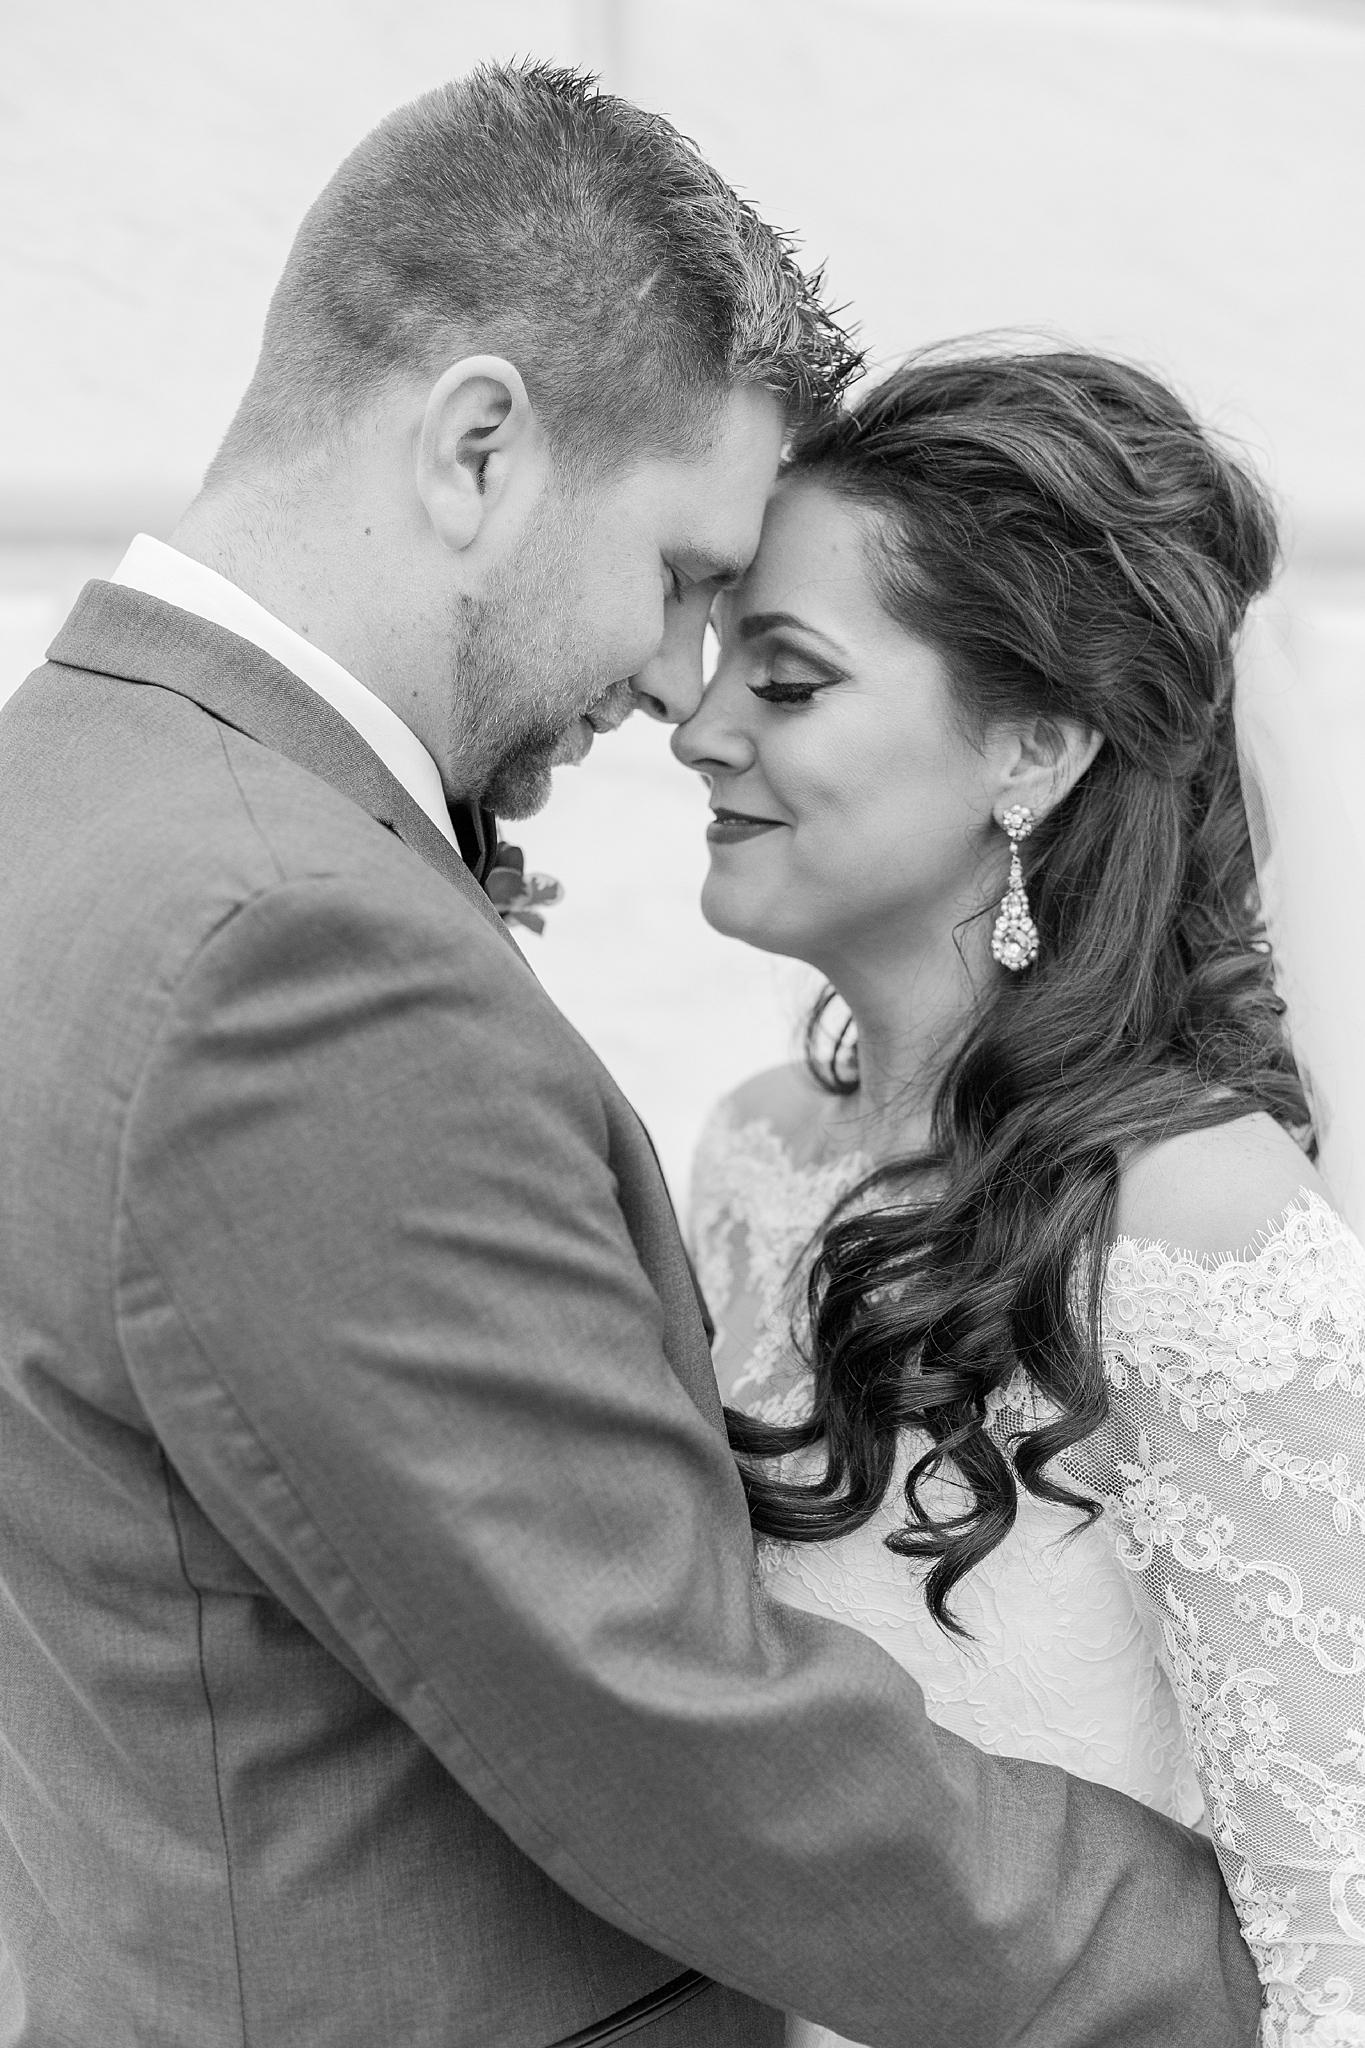 detroit-colony-club-wedding-regal-romantic-photography-in-detroit-mi-by-courtney-carolyn-photography_0012.jpg